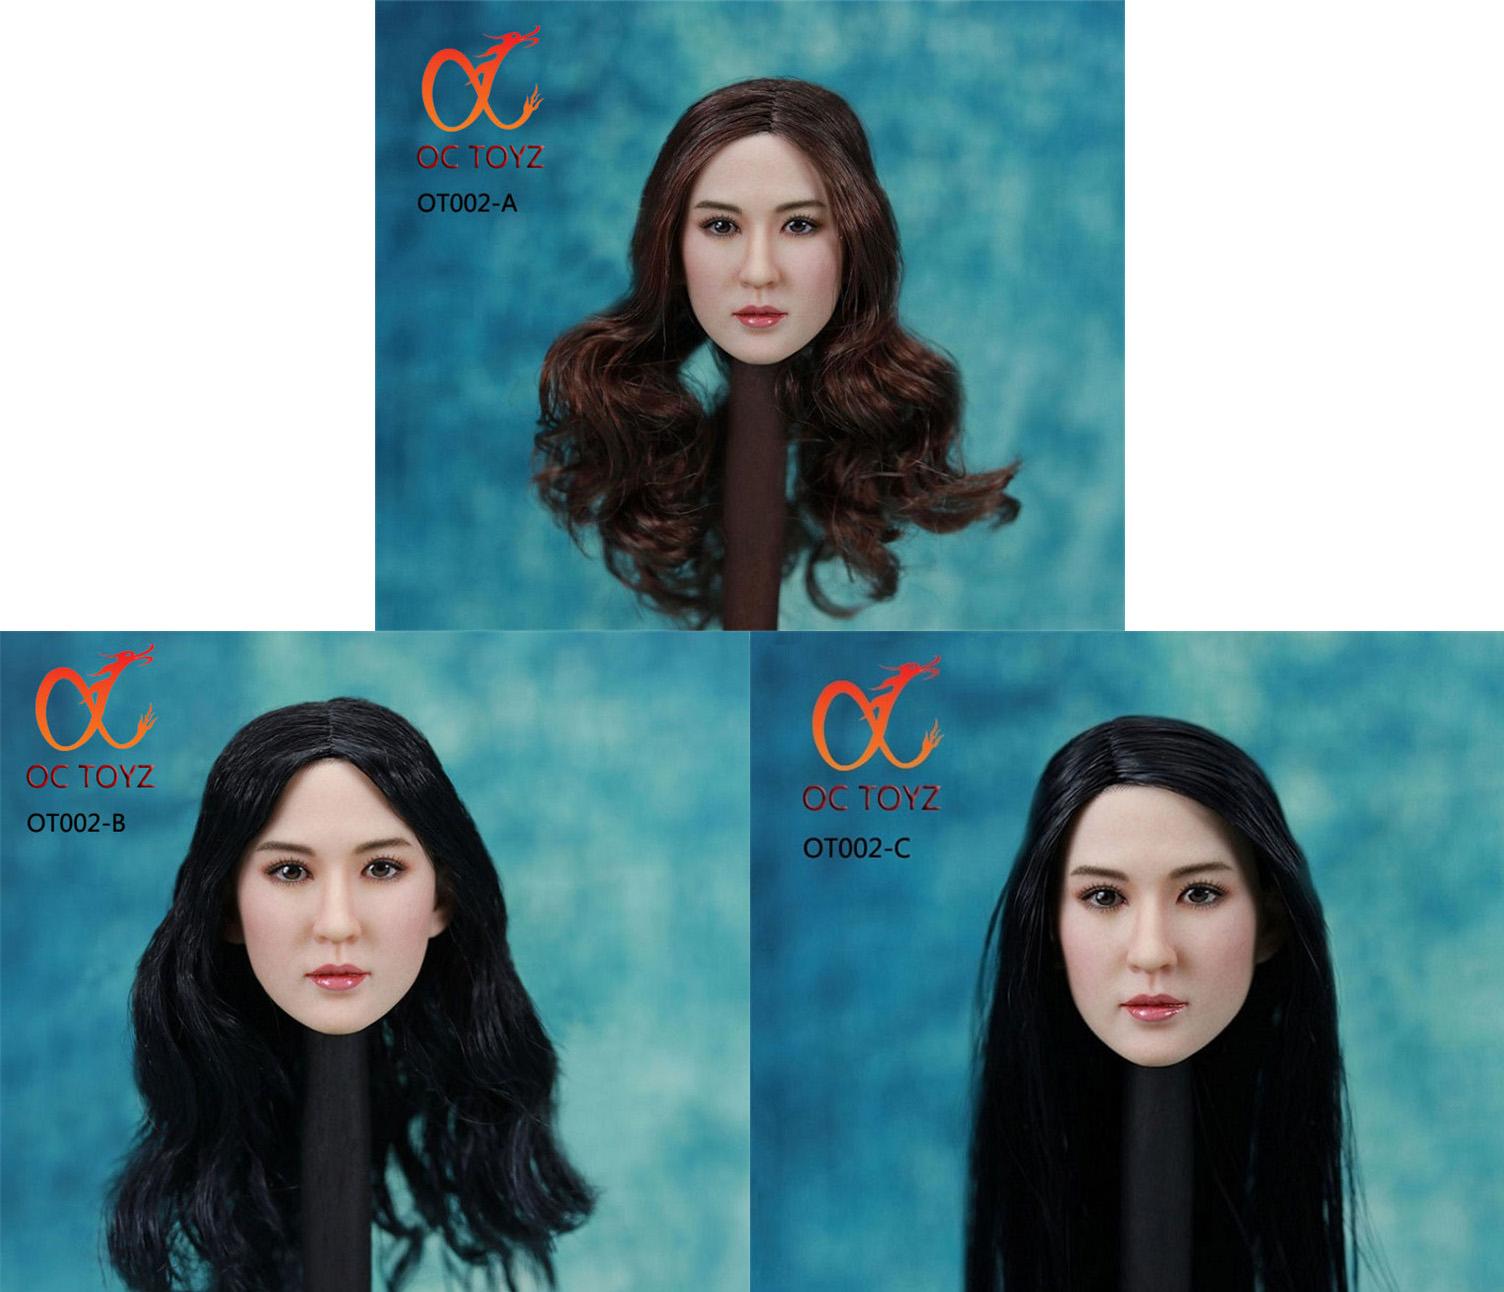 OC TOYZ OTOO2A / OT002B / OT002C Asian female headsculpt